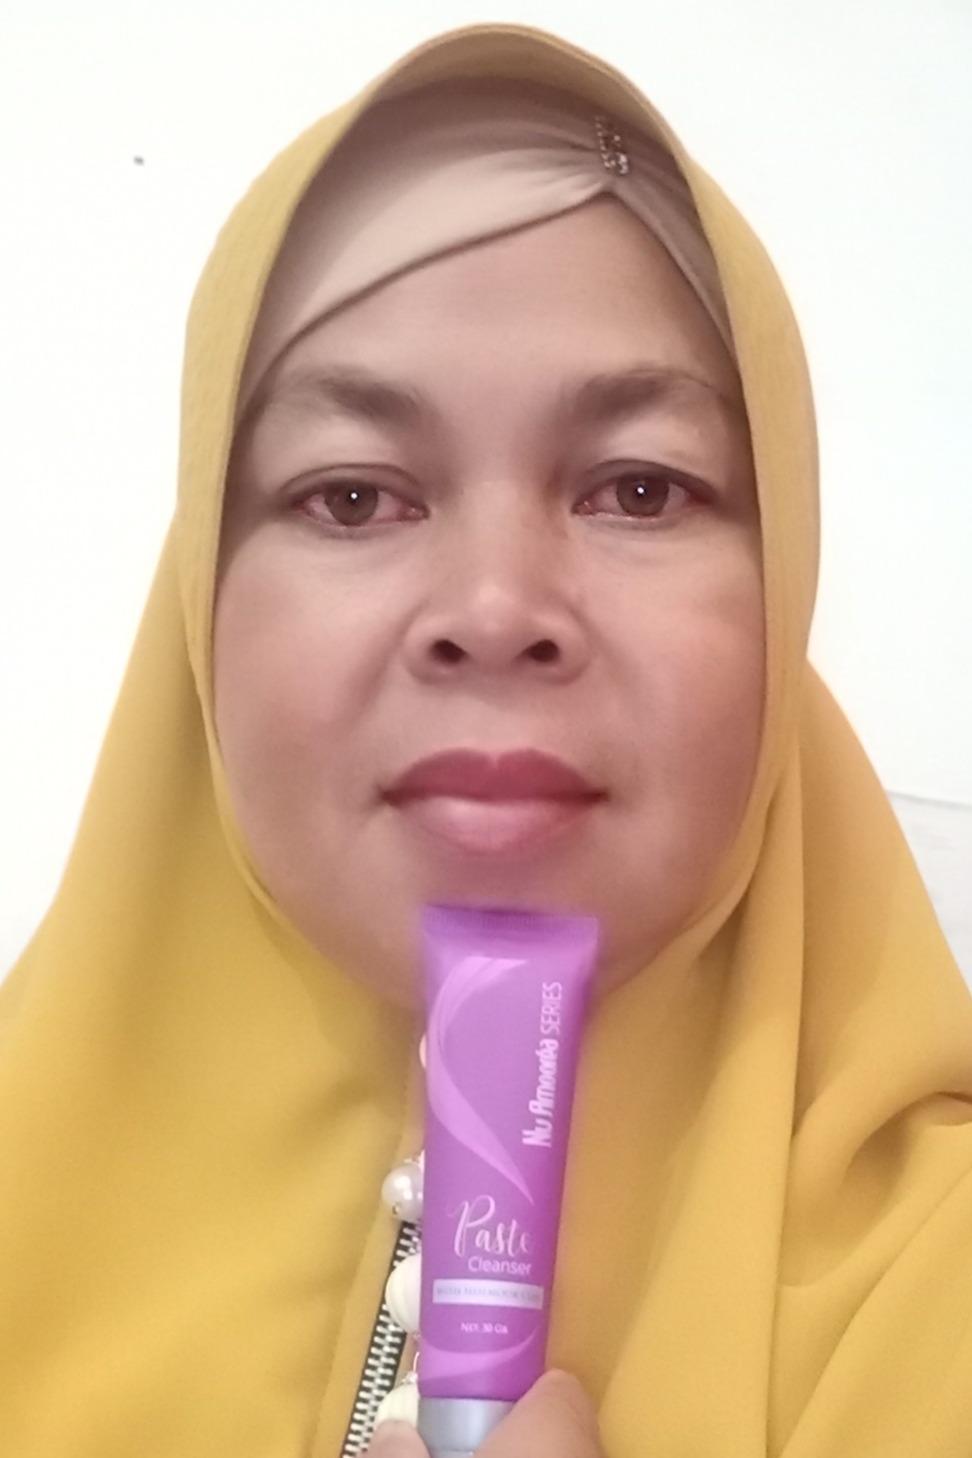 https://nuamooreabeauty.com/cdn/images/member/member-nu-amoorea-119-20181228122612.jpeg